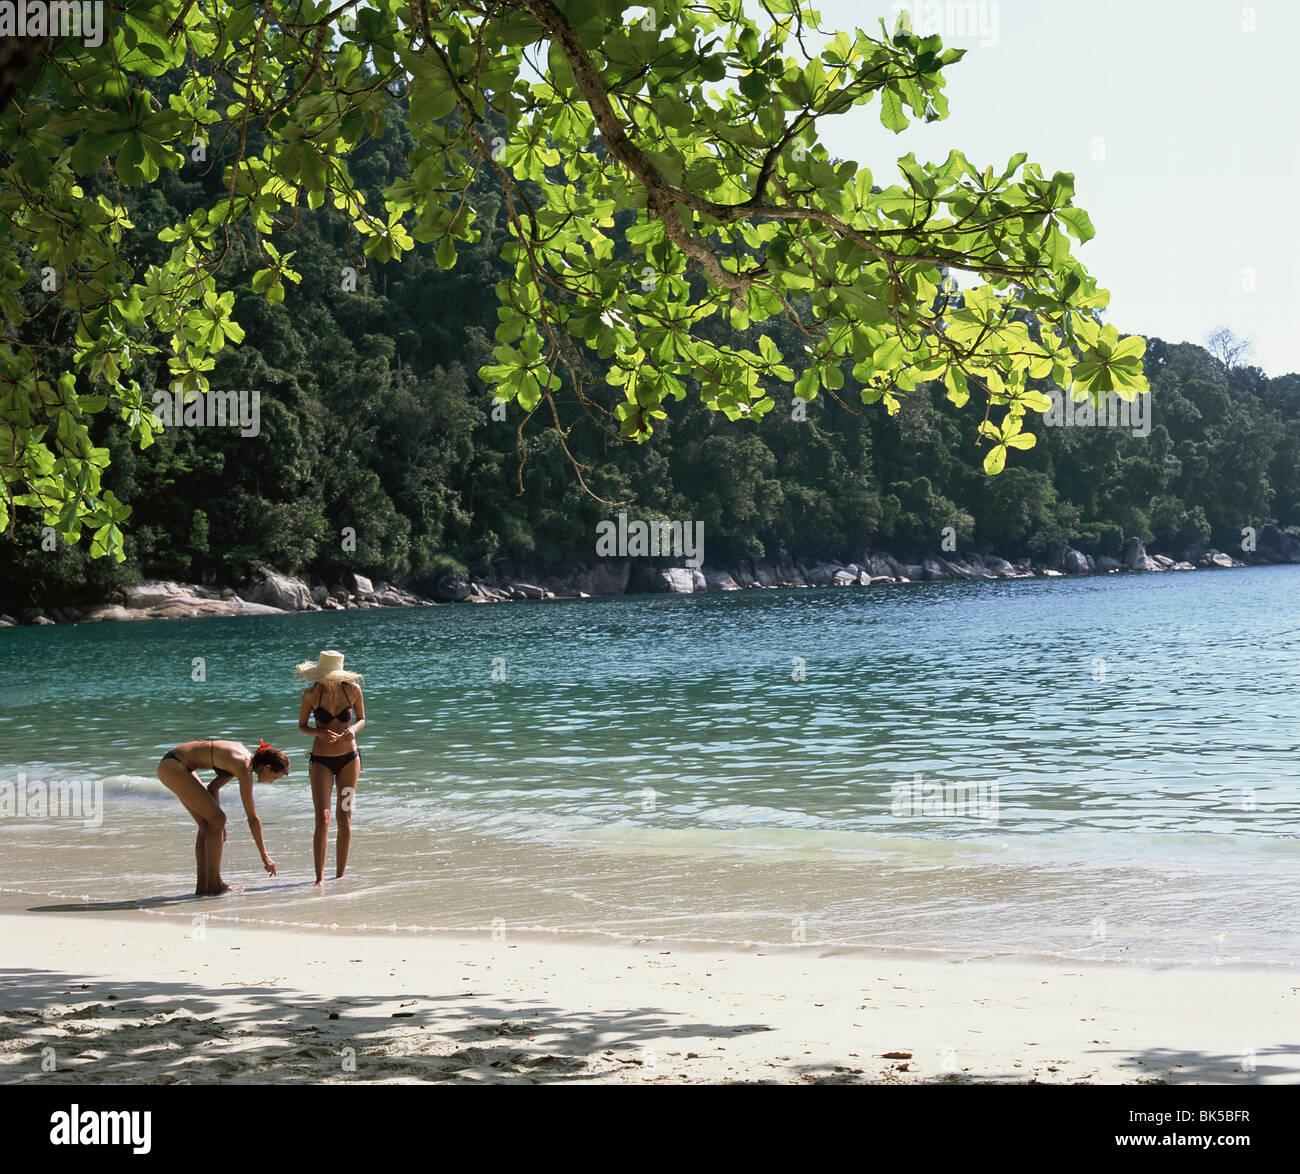 Emerald Bay, Pangkor Laut, Malaysia, Southeast Asia, Asia - Stock Image